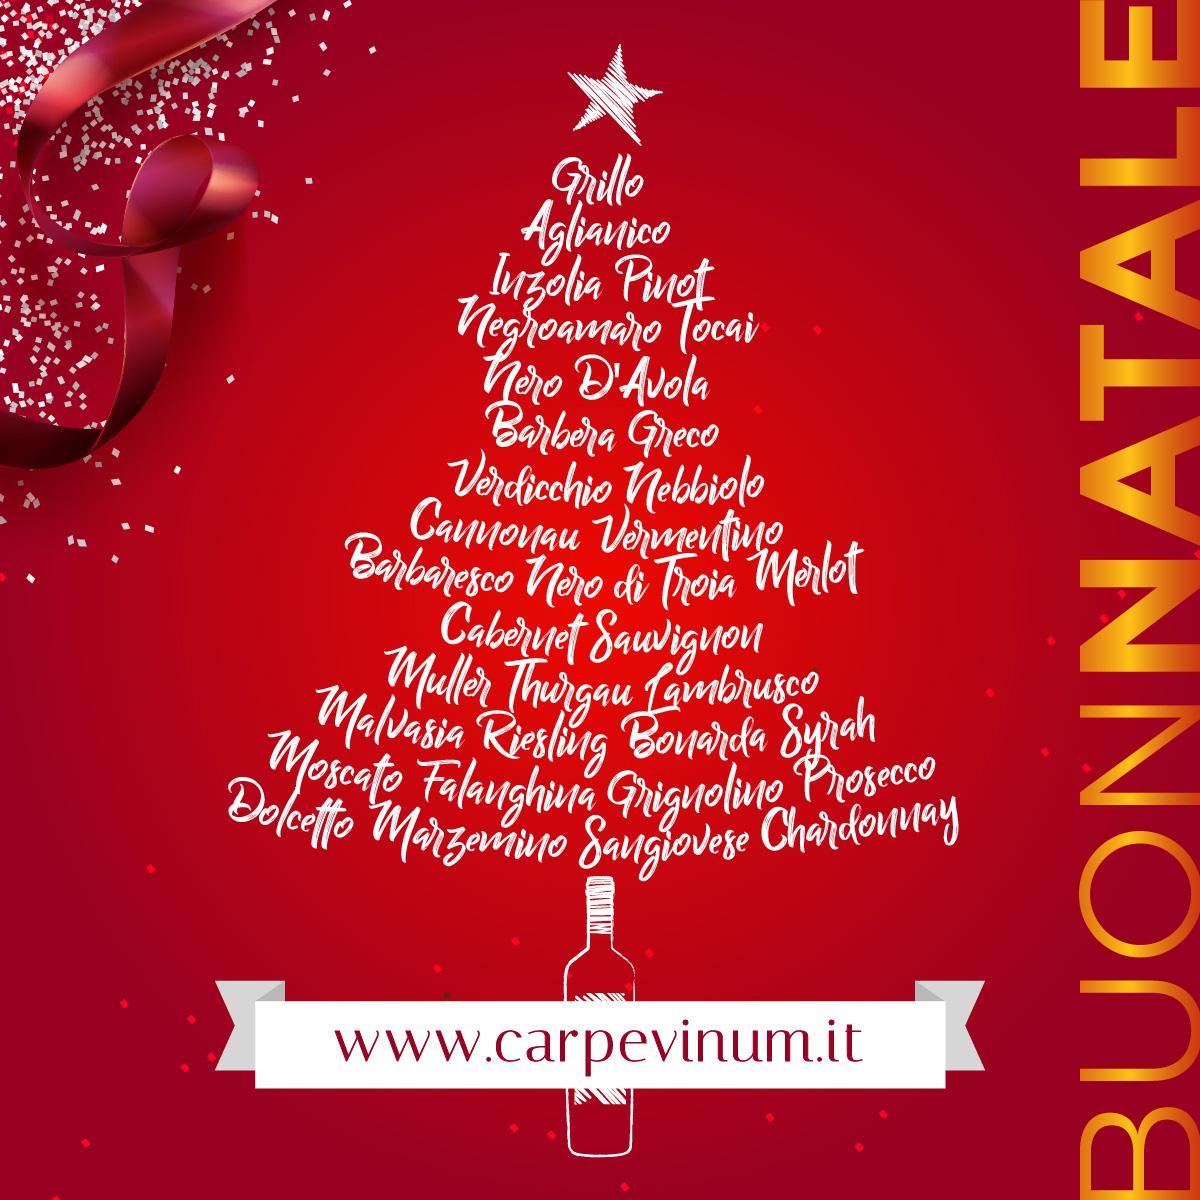 Buon Natale 2019 da Carpe Vinum